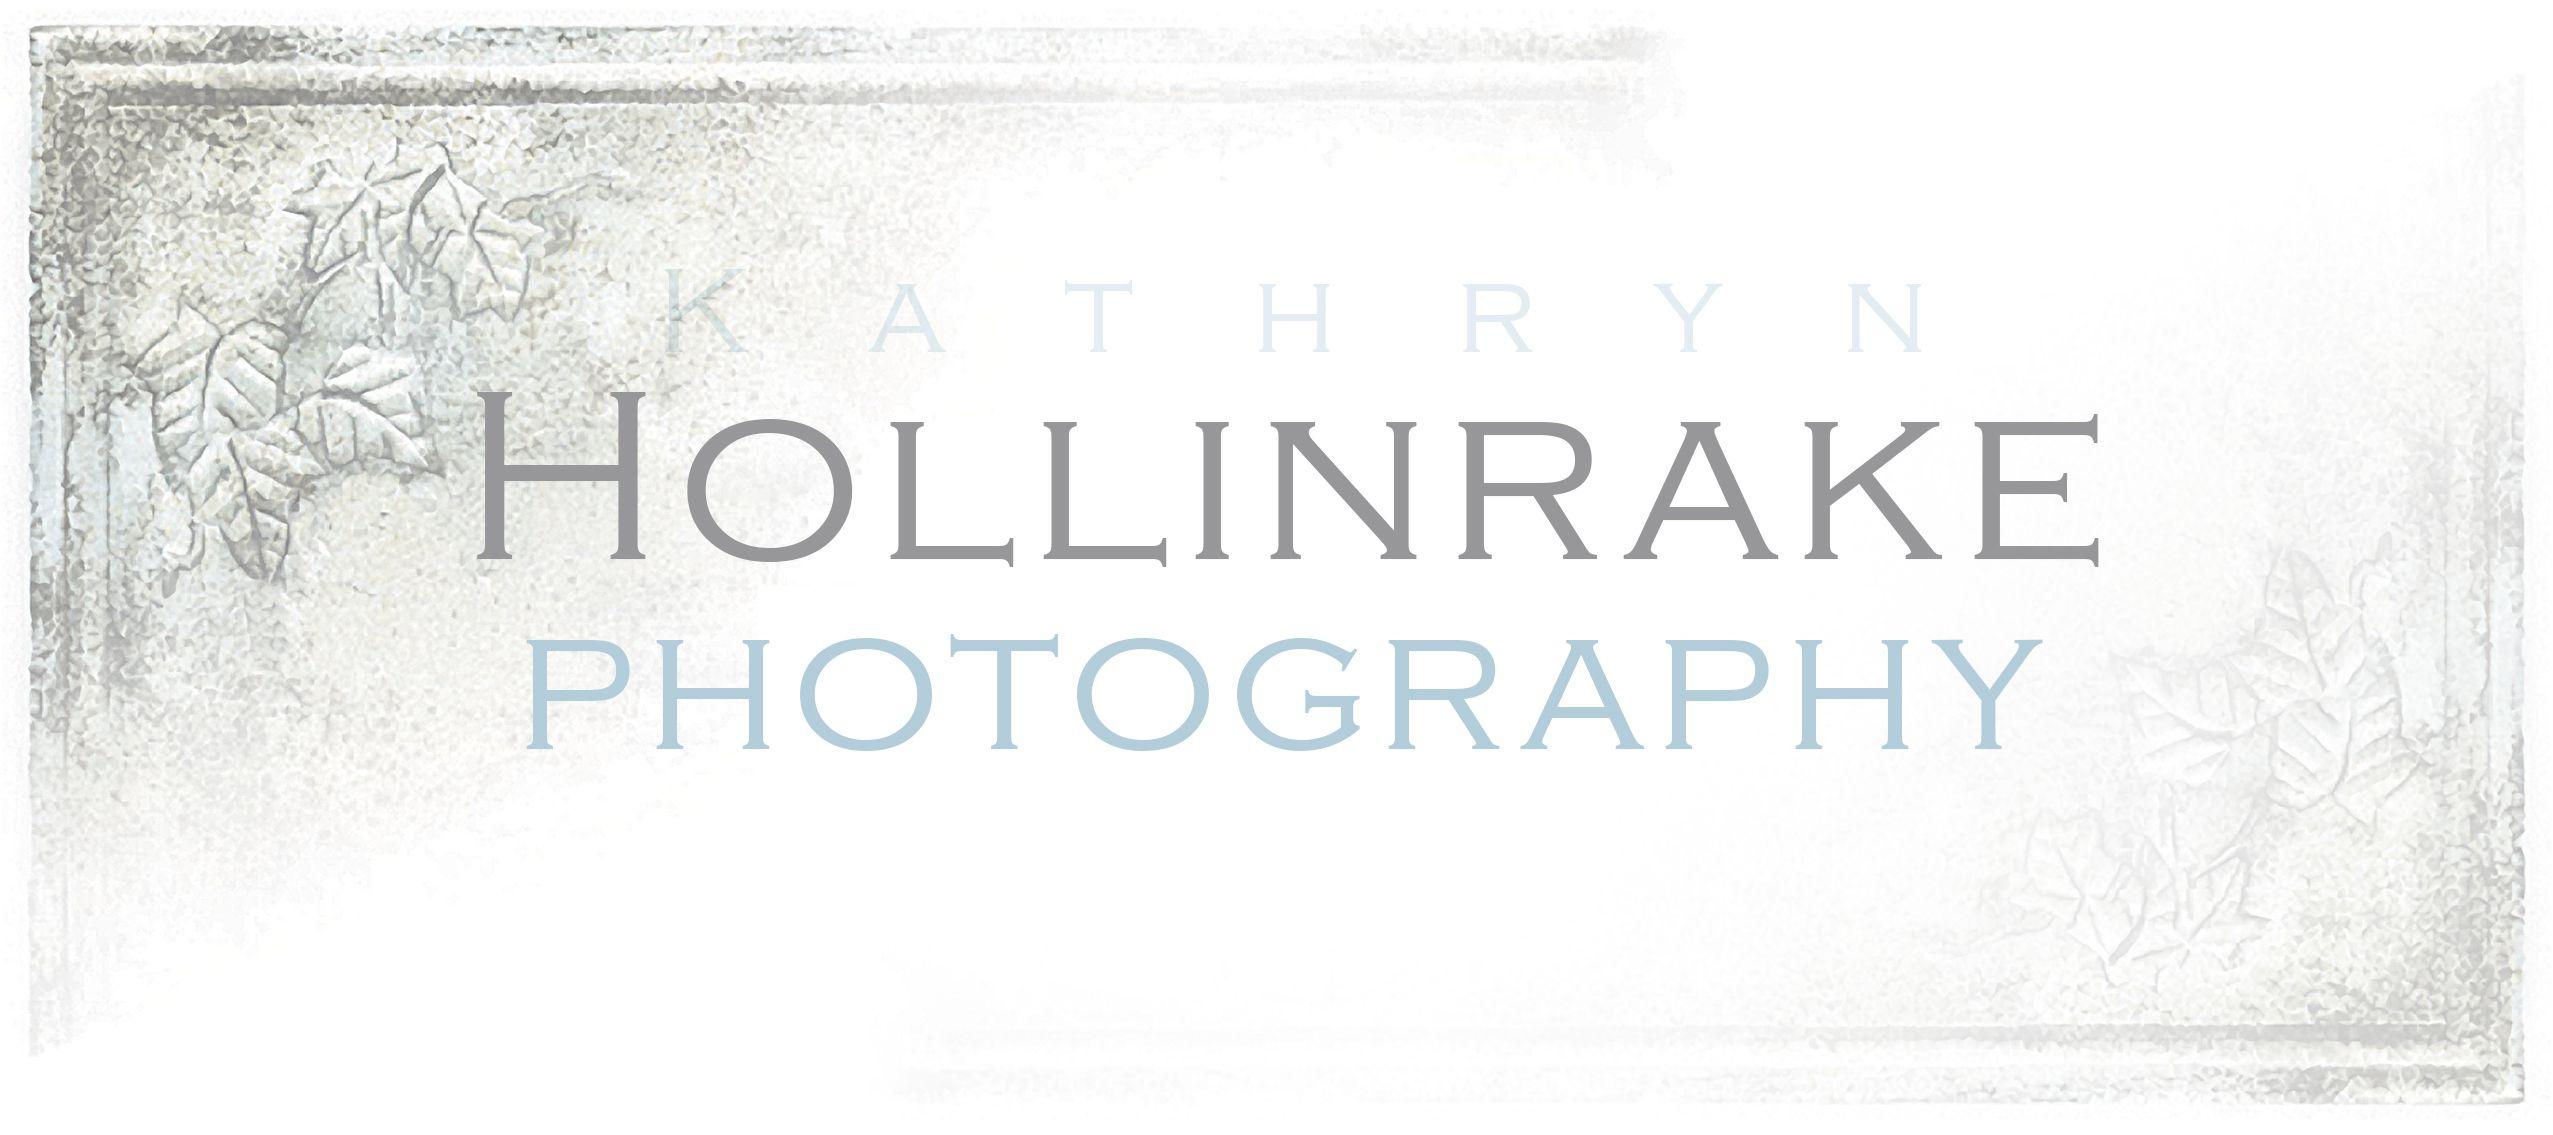 Kathryn Hollinrake Photography